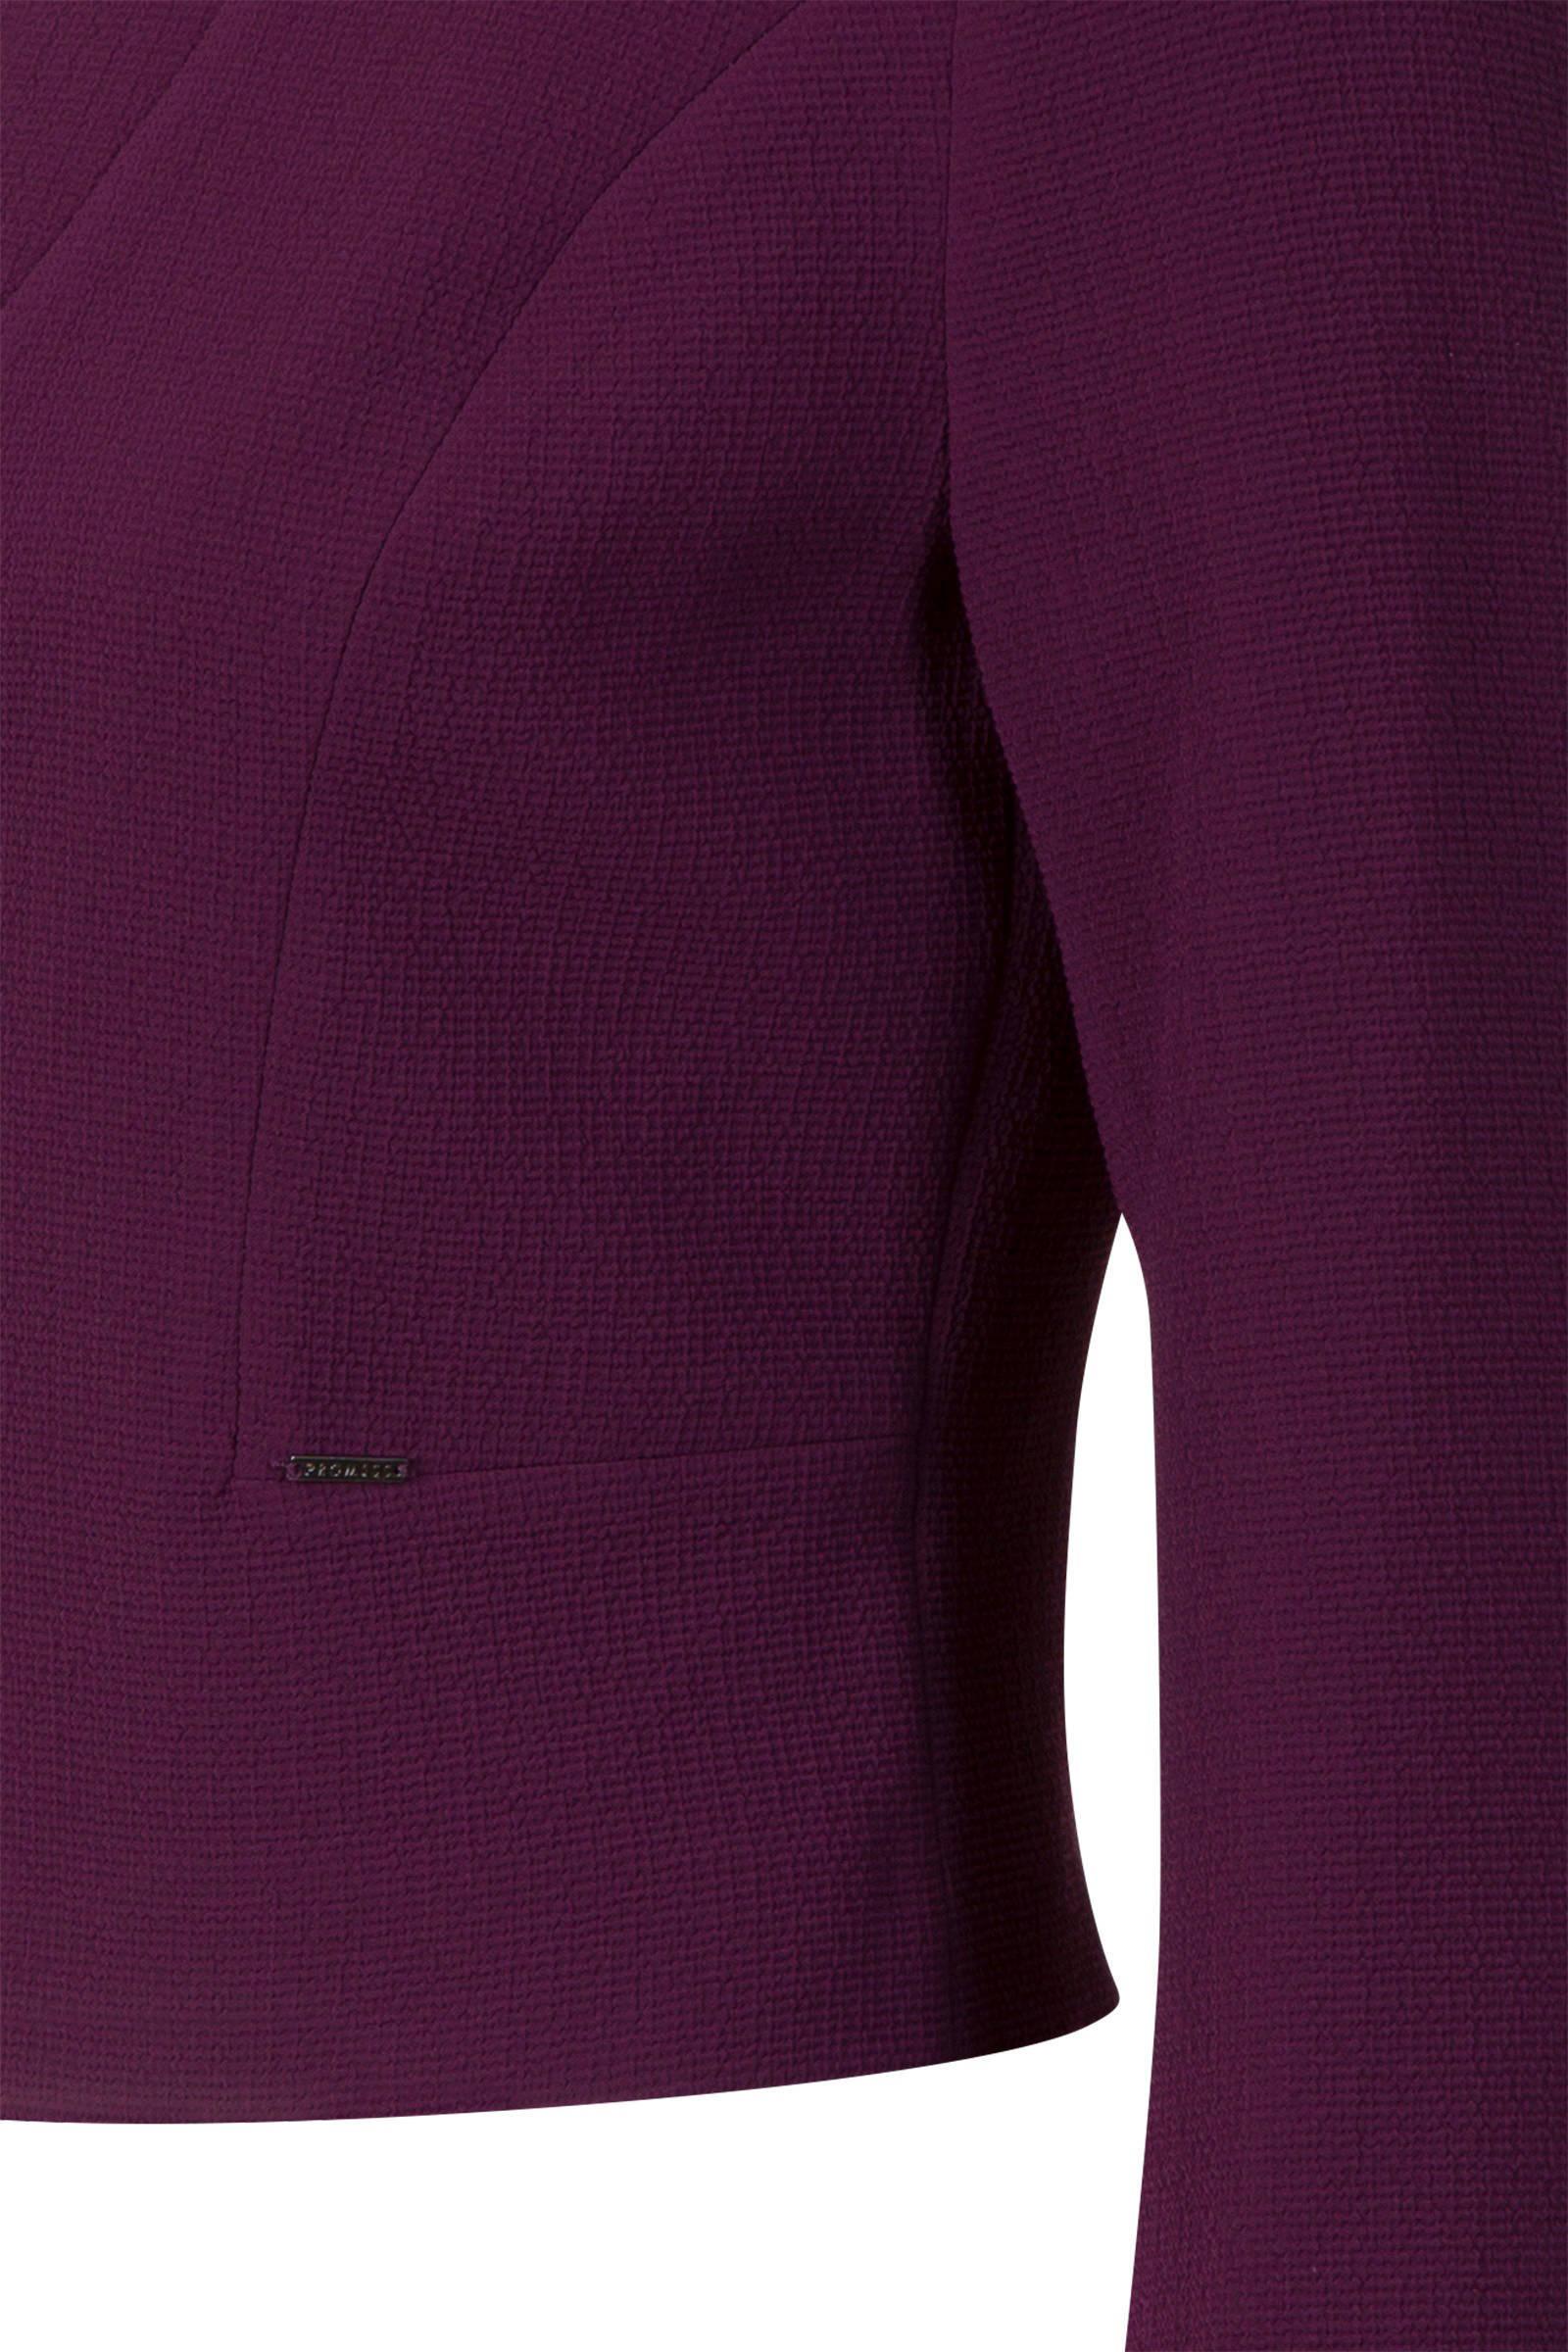 PROMISS blazer paars | wehkamp